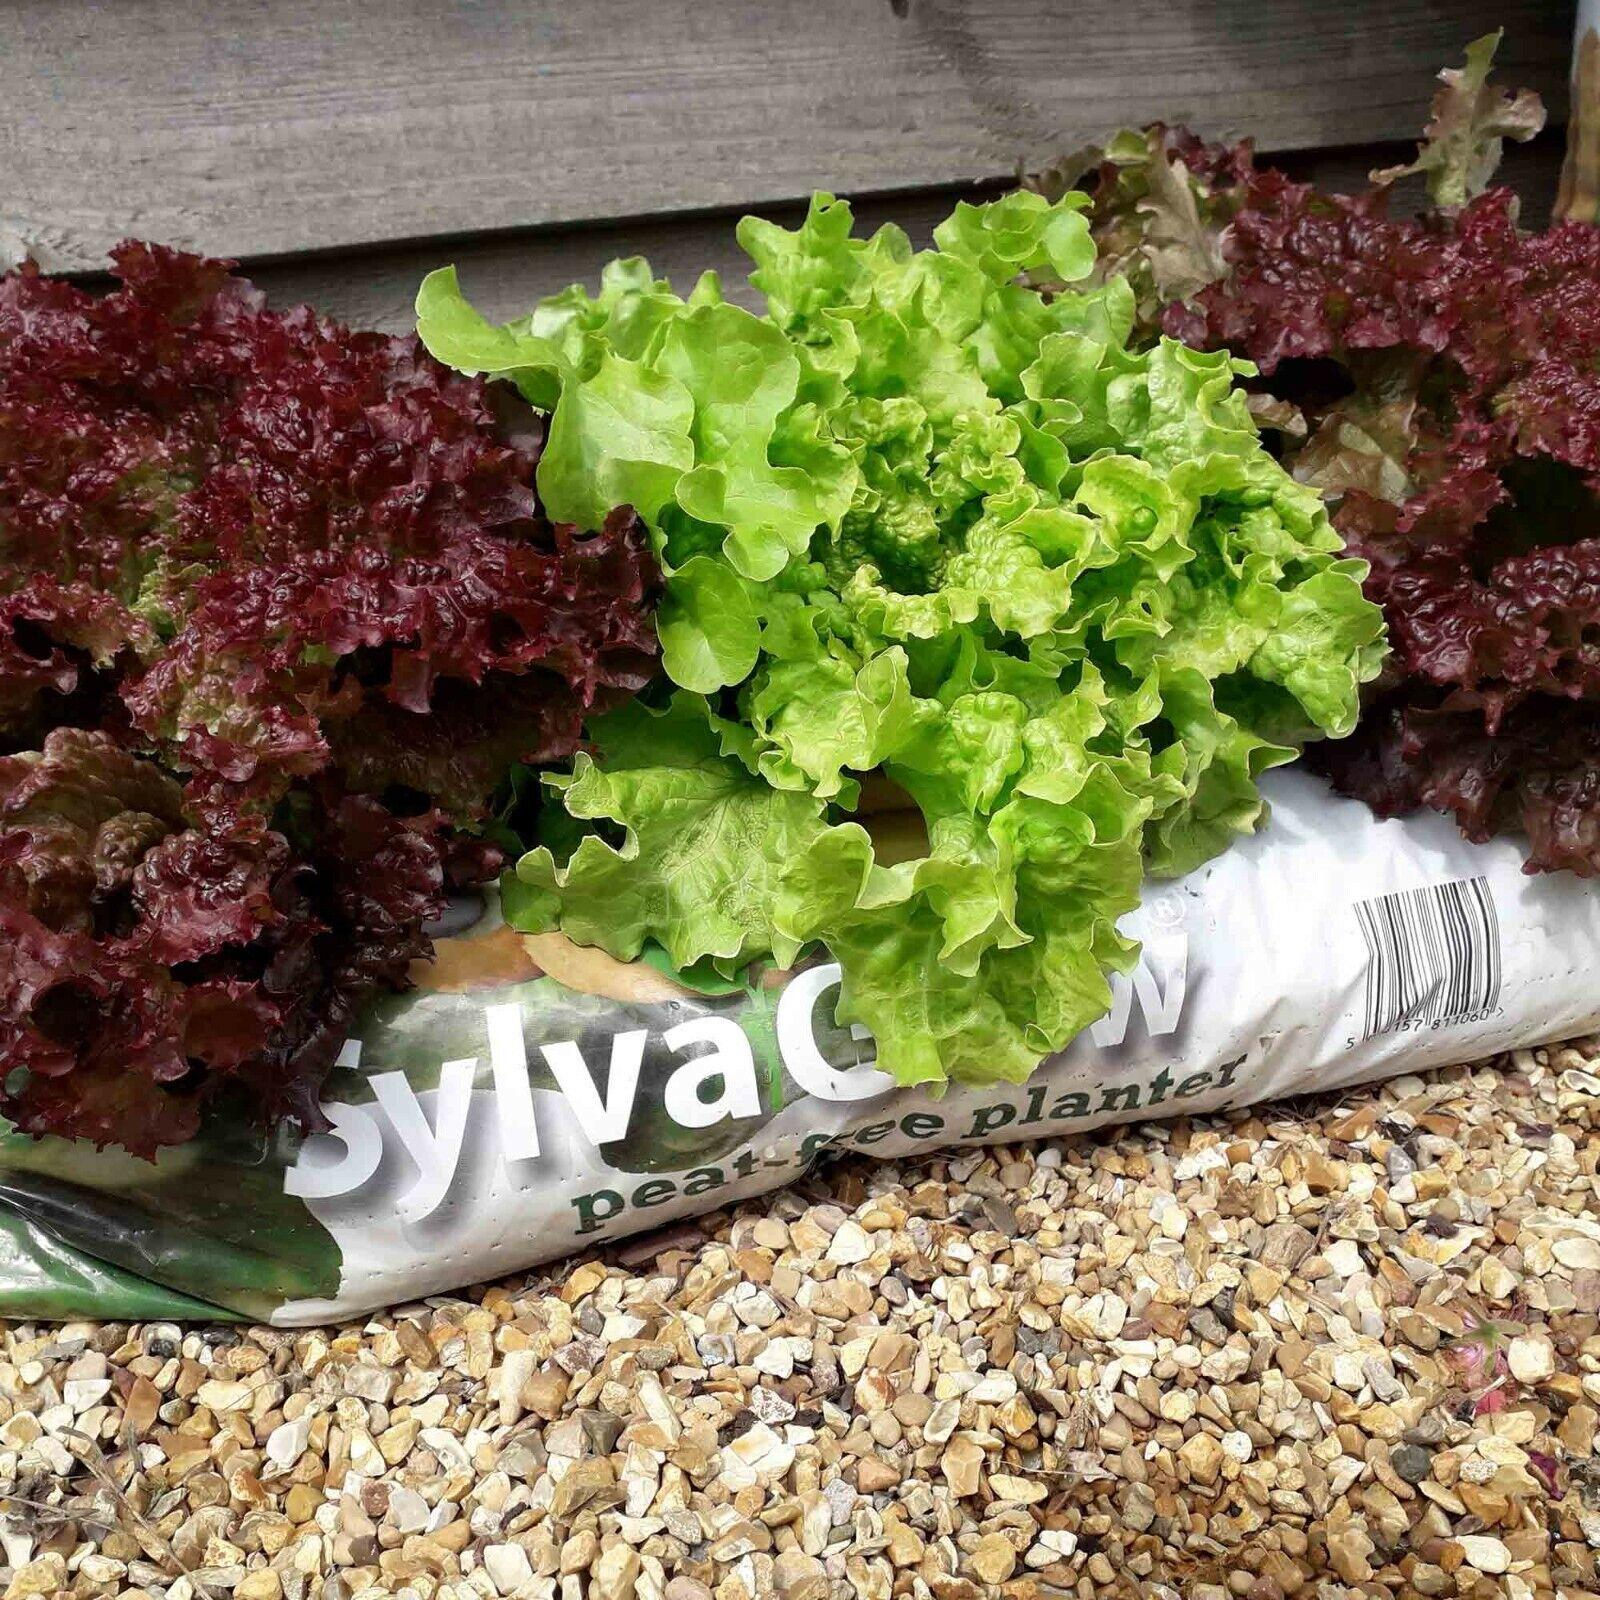 RHS SylvaGrow Peat-Free Organic Planter Soil Association Approved 45L Grow Bag